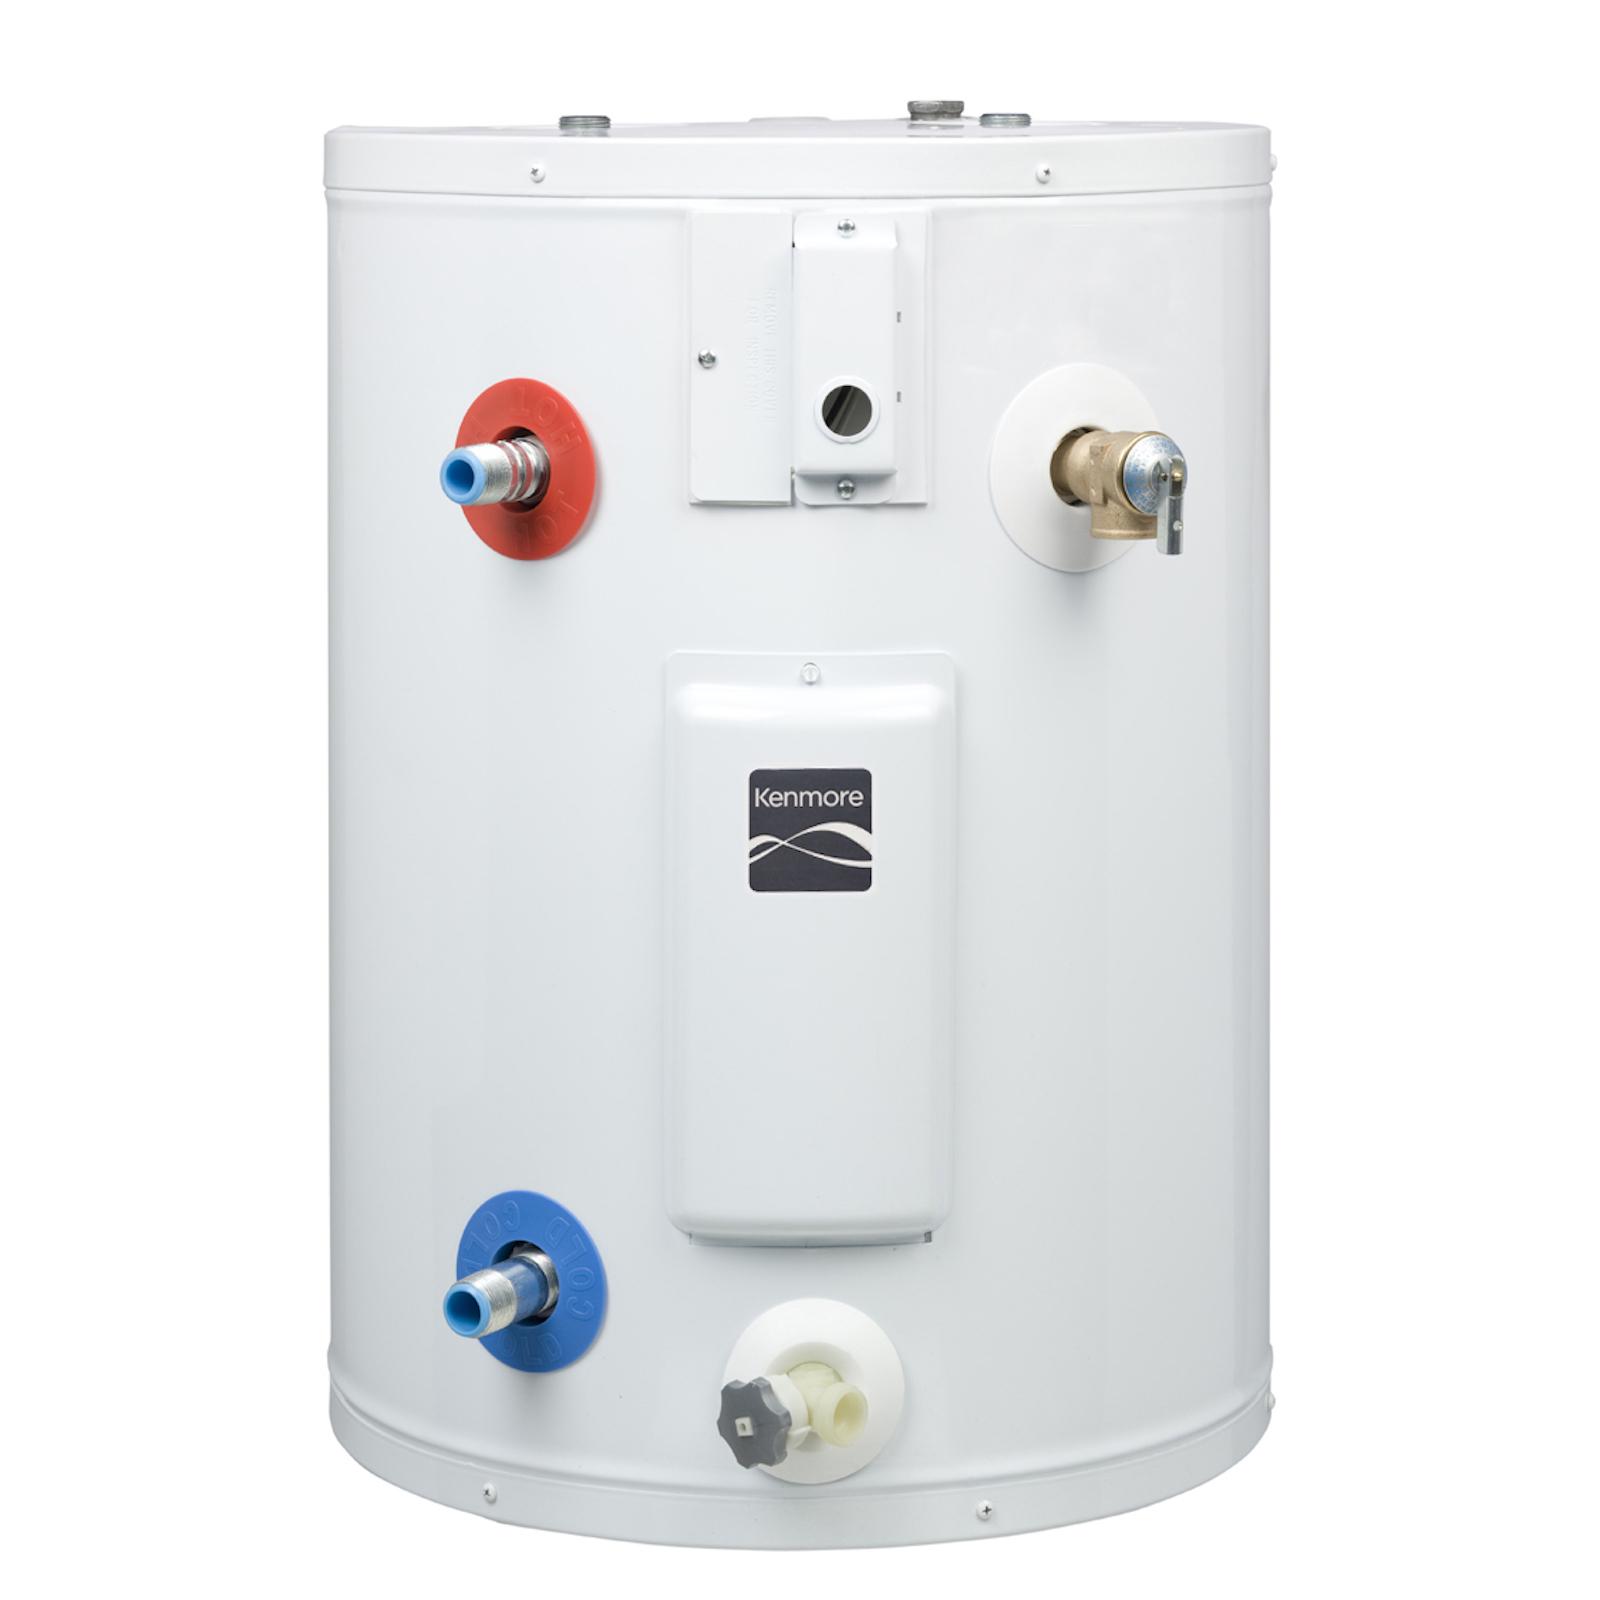 kenmore hot water heater wiring diagram thyroid and larynx anatomy rheem 40 gallon electric